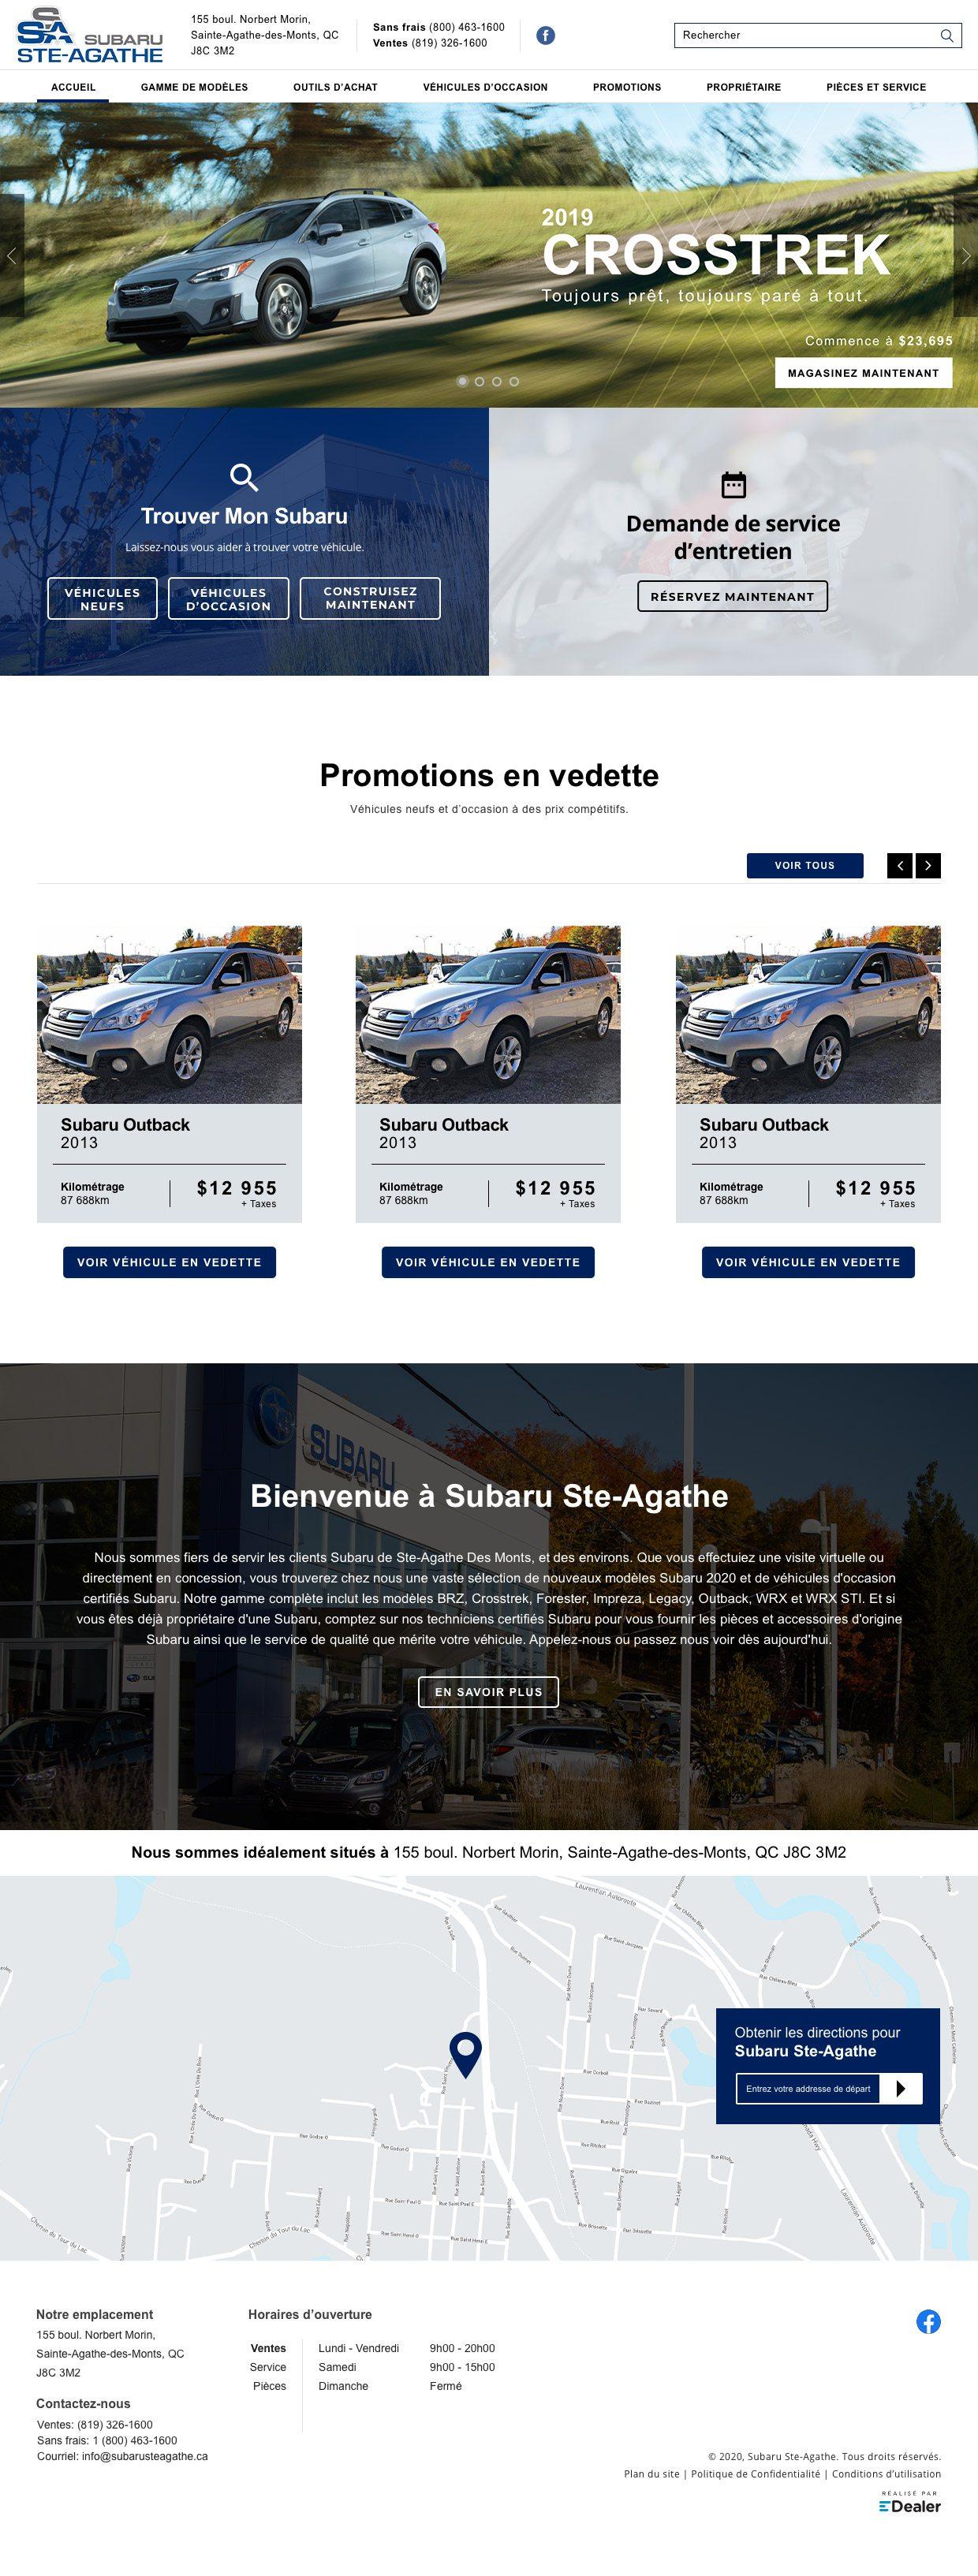 Subaru Ste-Agathe